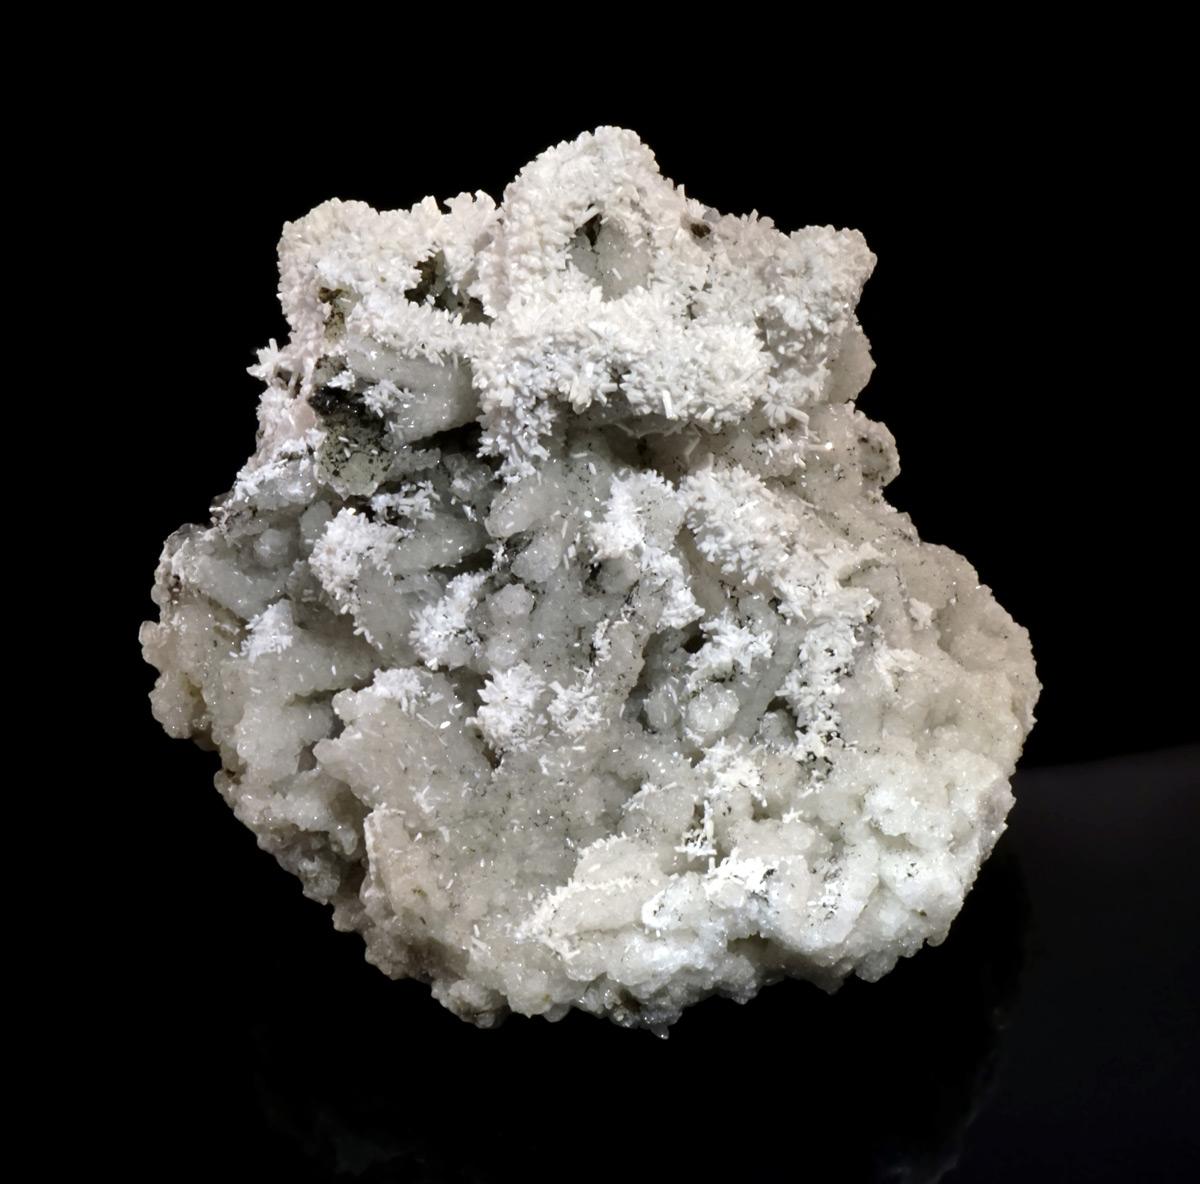 Laumontite on Quartz Casts